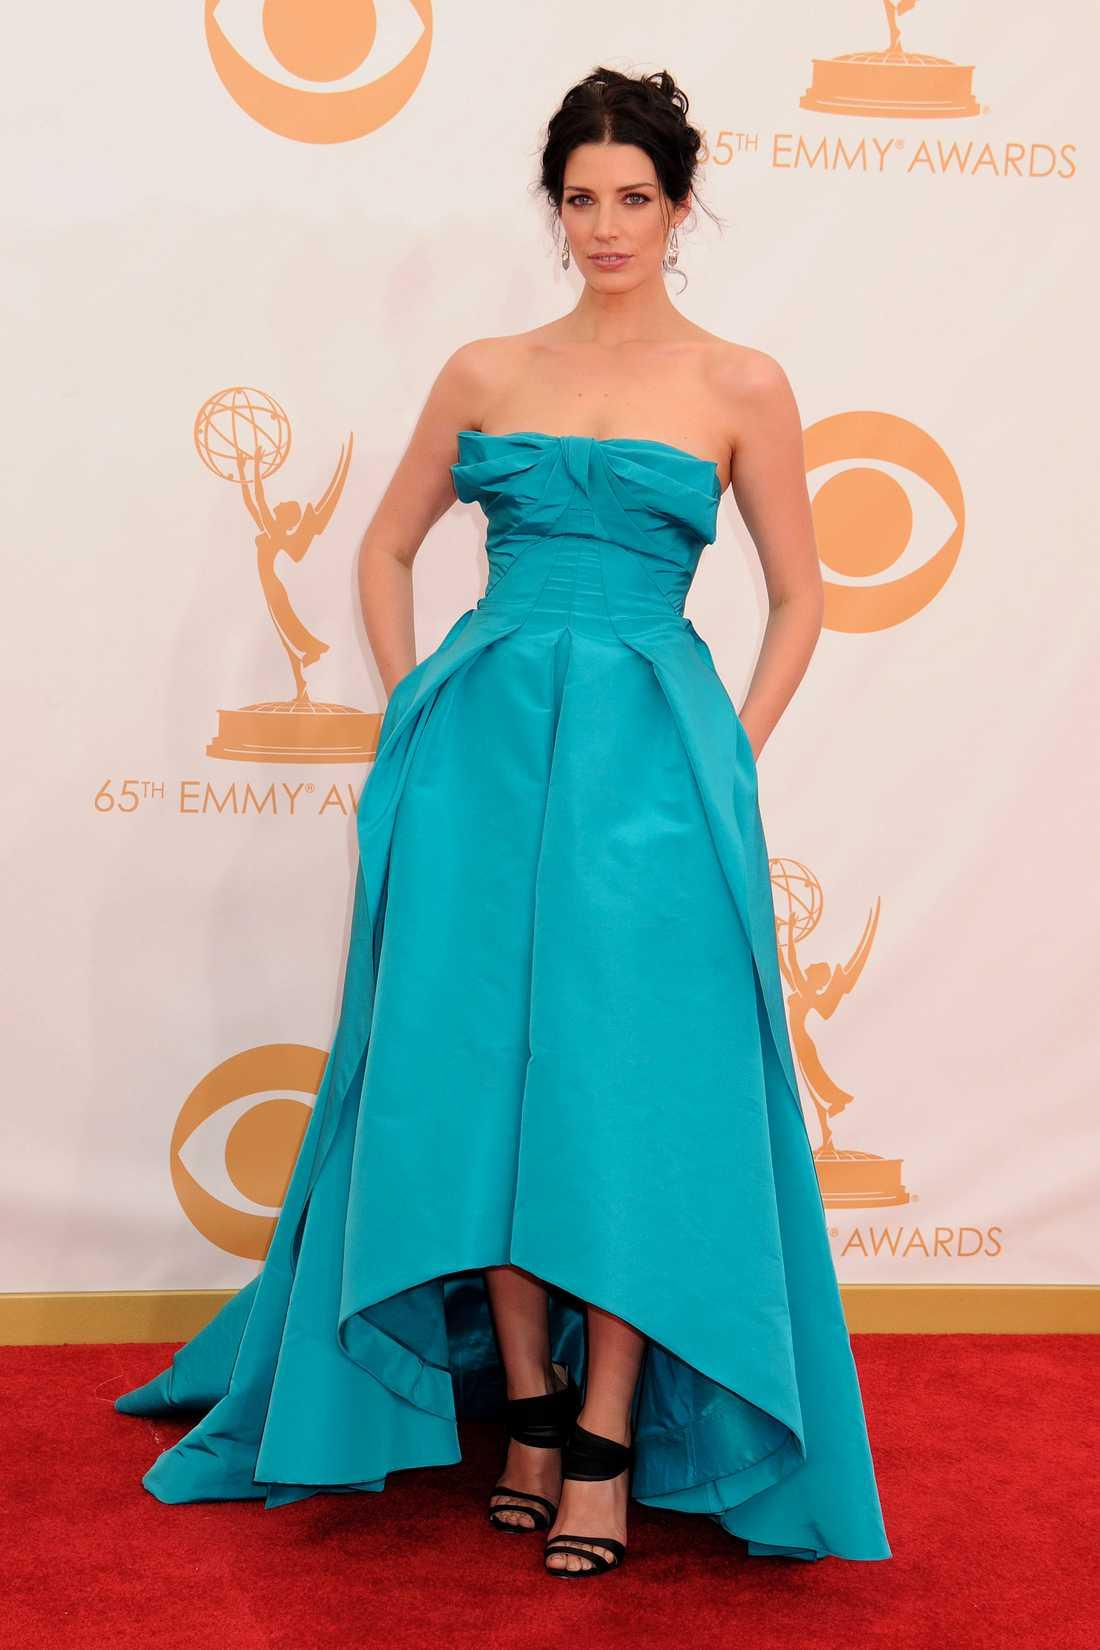 Jessica Pare En galafavorit är ofta Oscar de la Renta, här på Jessica Pare.